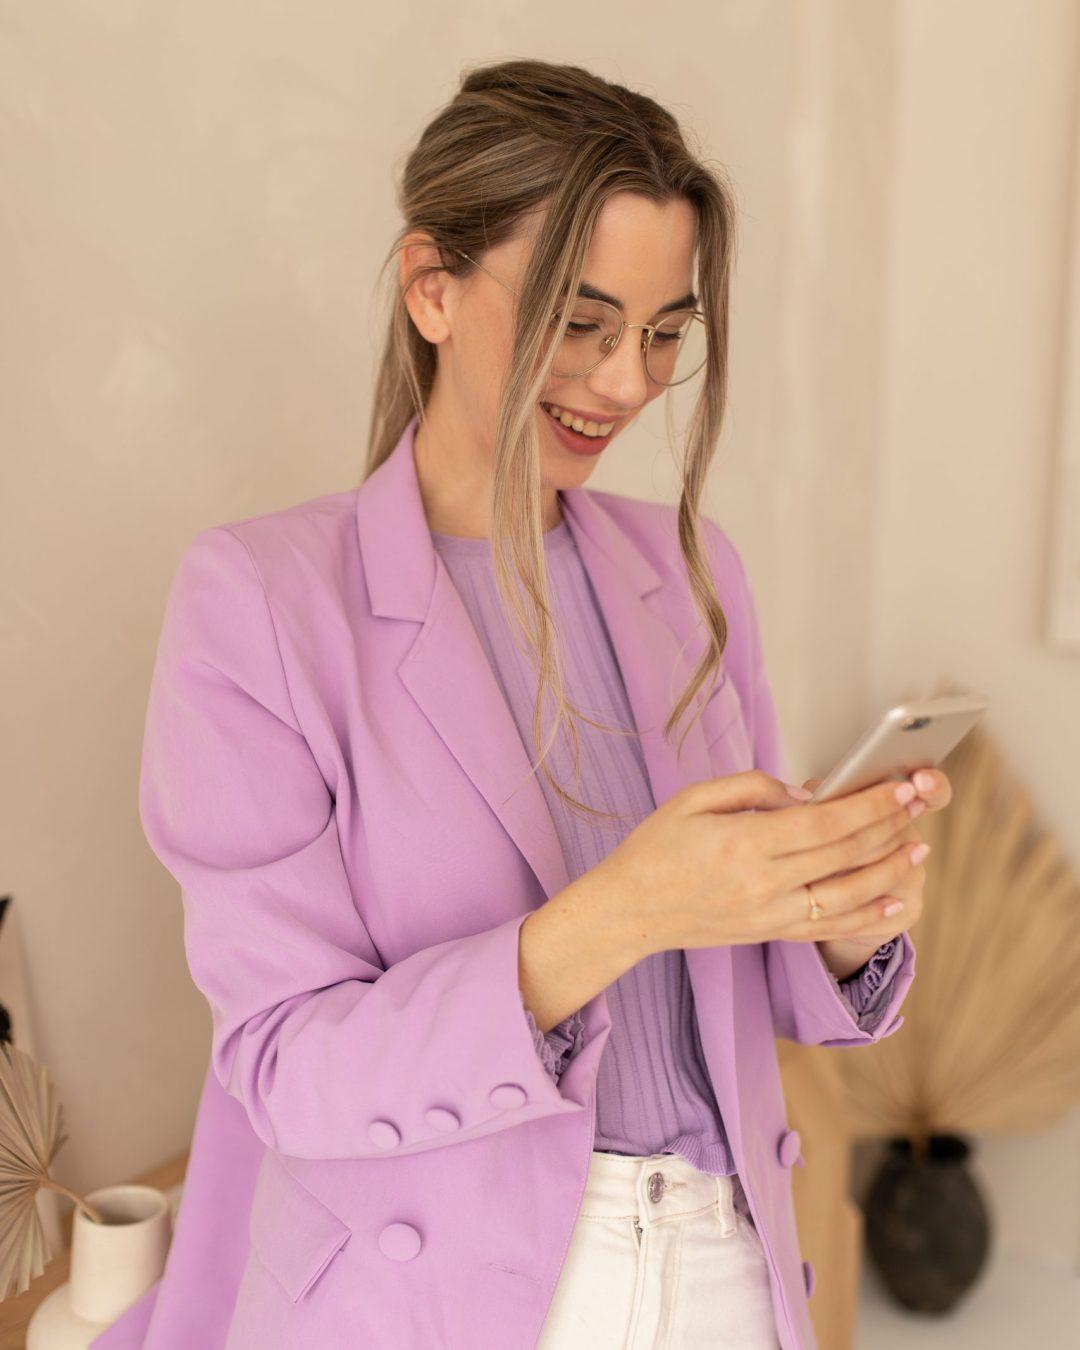 lynn quanjel op haar telefoon